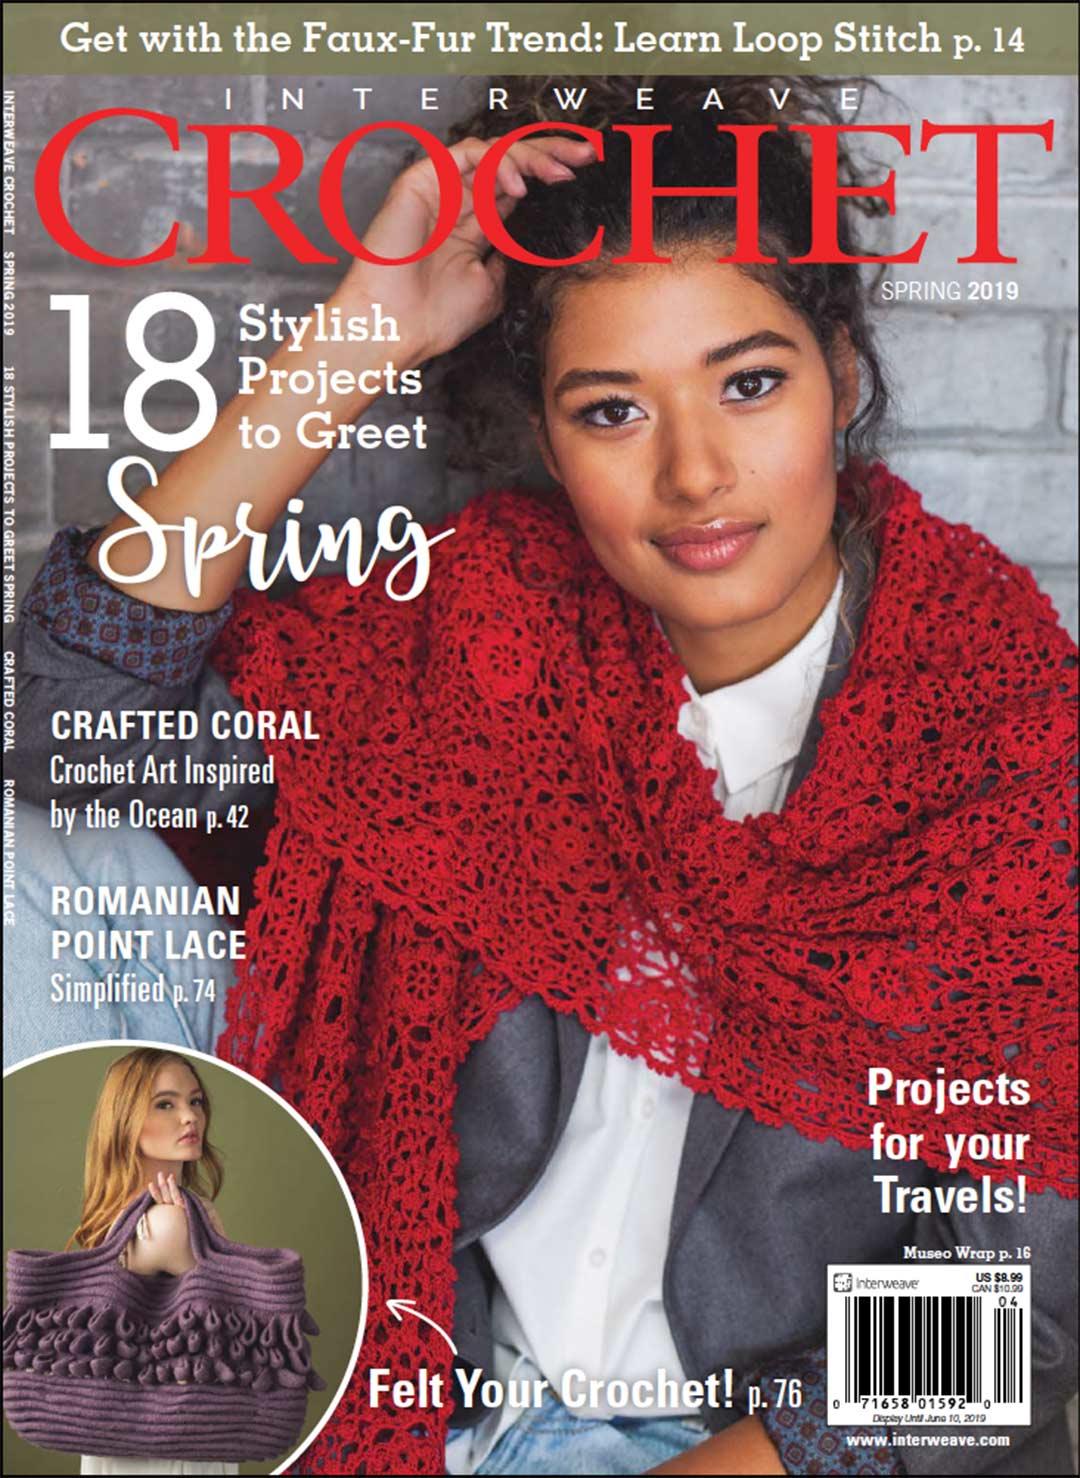 subscribe Interweave Crochet